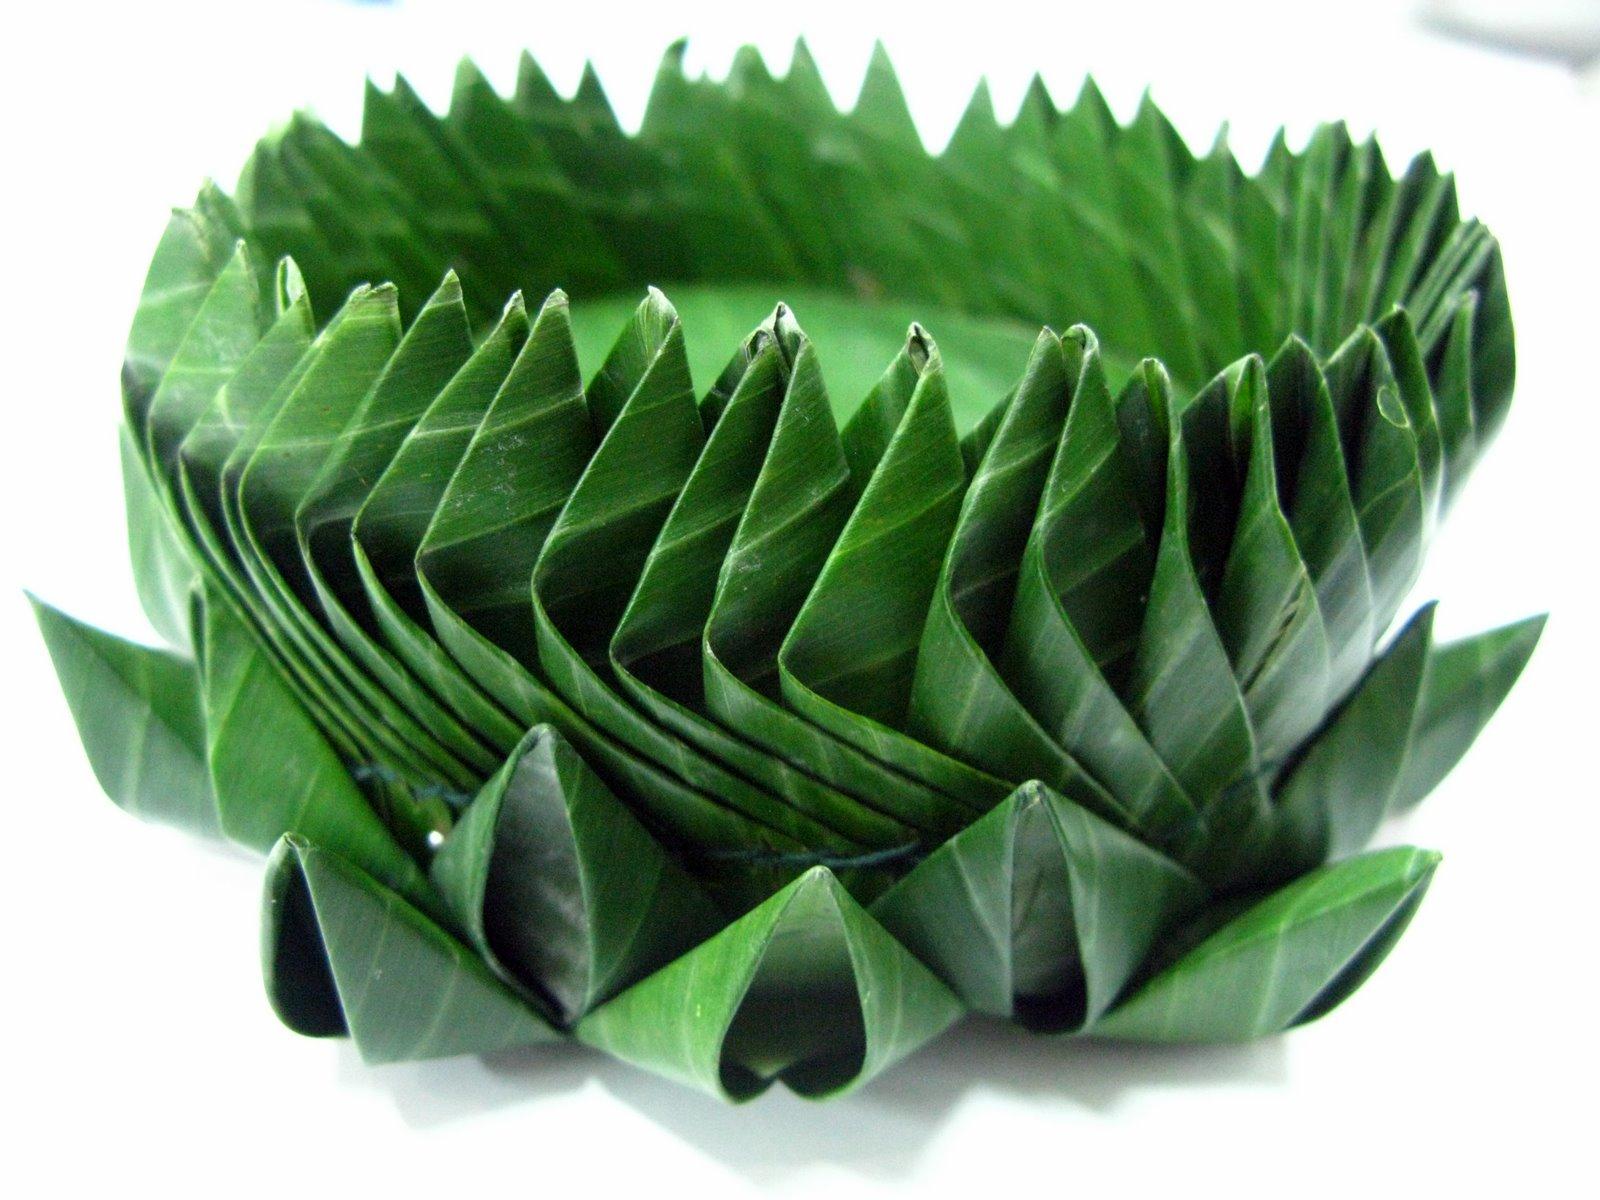 How To Weave A Basket From Banana Leaves : Tangcancook banana leaf weaving